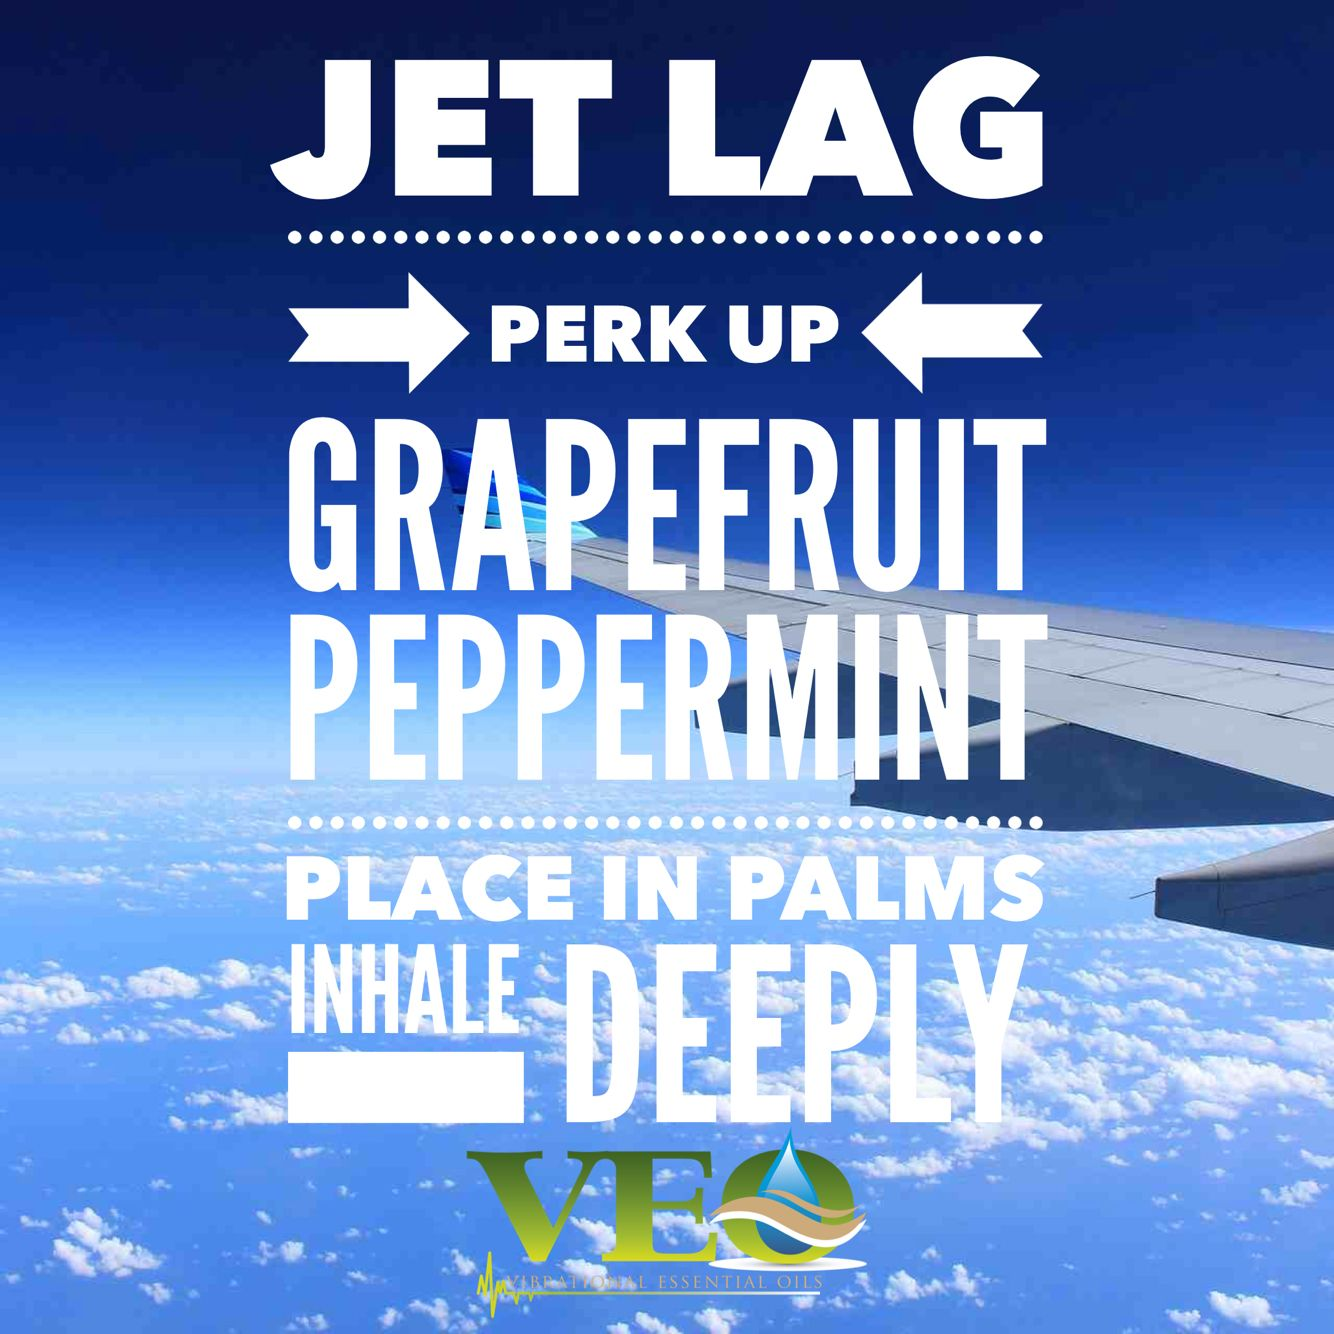 Essential Oil Recipe To Help With Jet Lag Essentialoils Essentialoilblends Jet Lag Young Living Oils Homemade Essential Oils